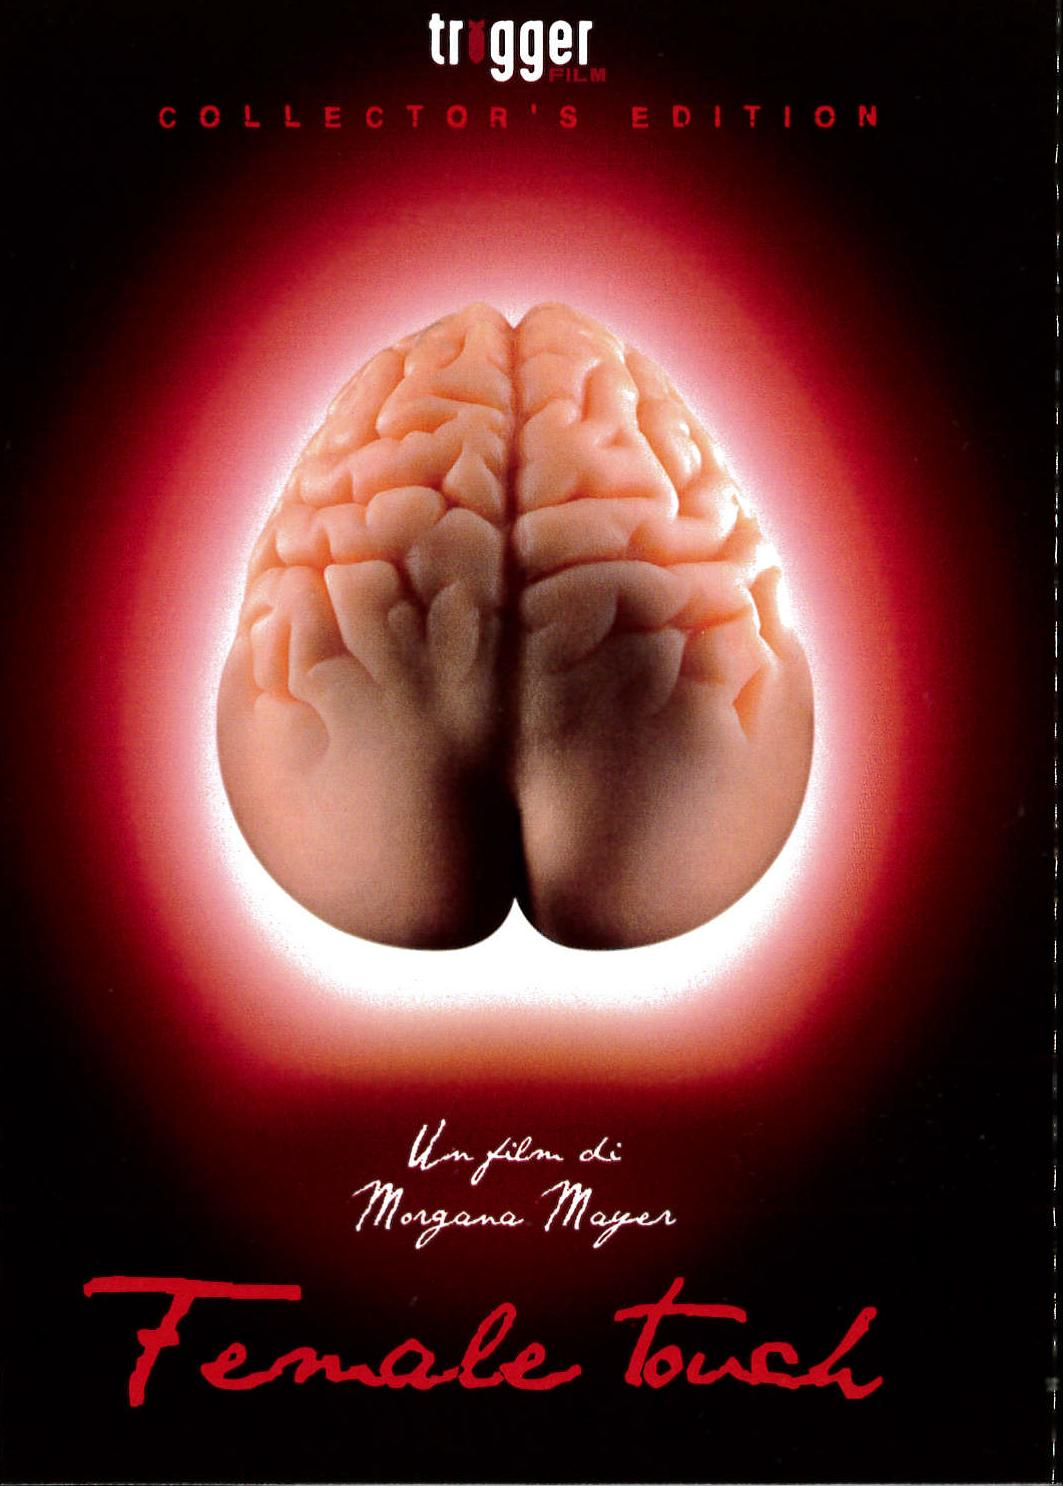 FEMALE TOUCH - ED.NUMERATA (DVD)